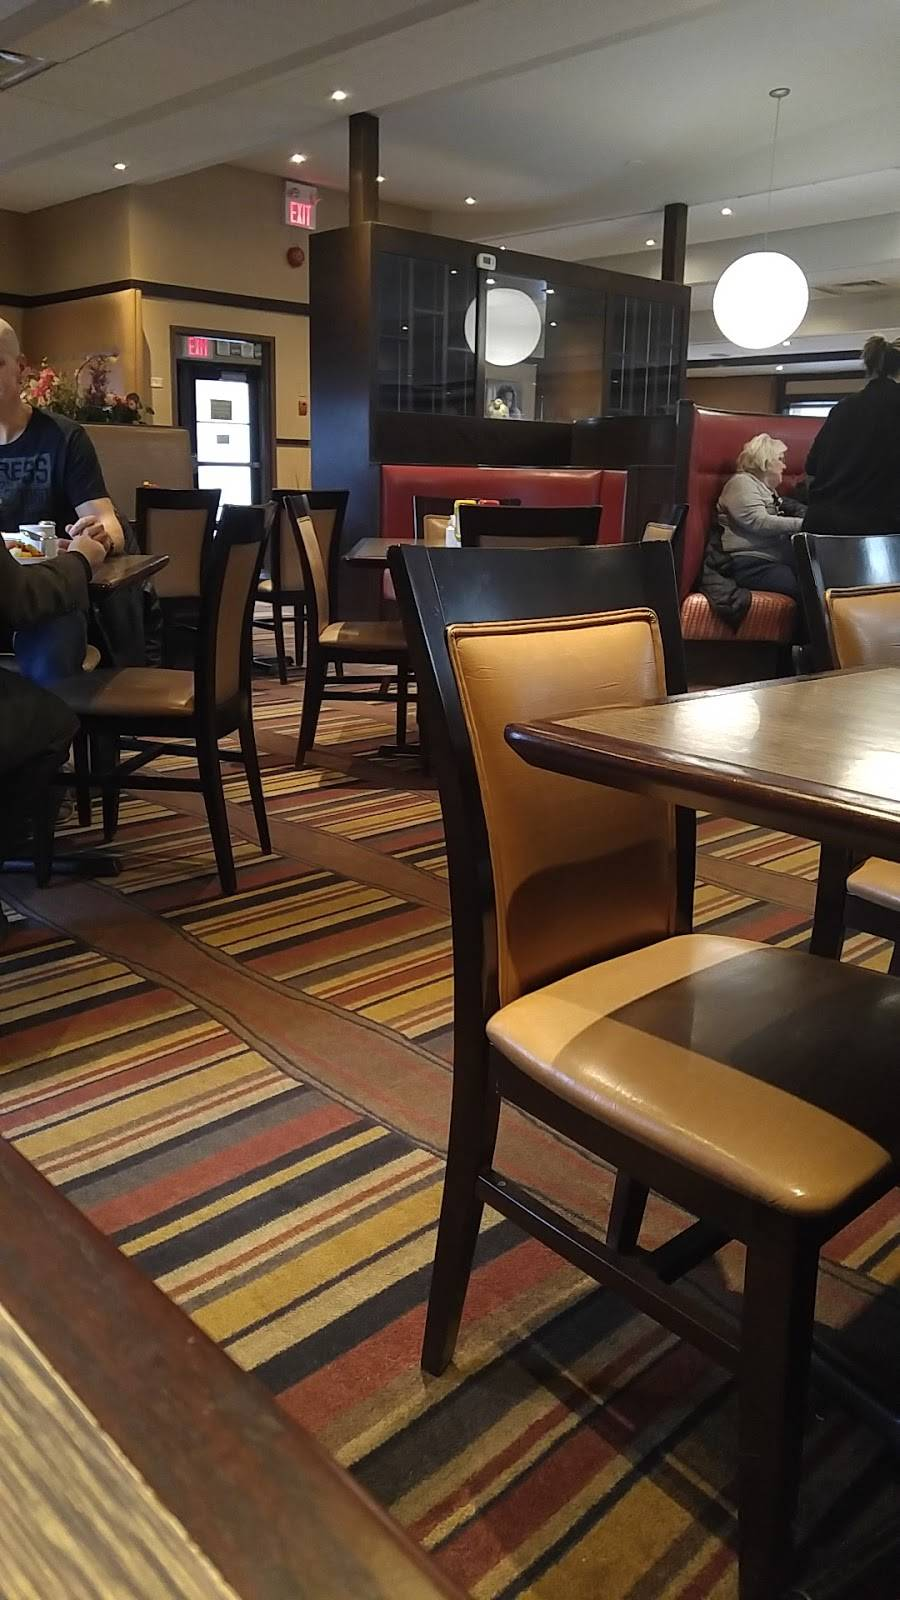 Fiftys Grill & Deli | restaurant | 426 Hespeler Rd, Cambridge, ON N1R 6J7, Canada | 5196220707 OR +1 519-622-0707